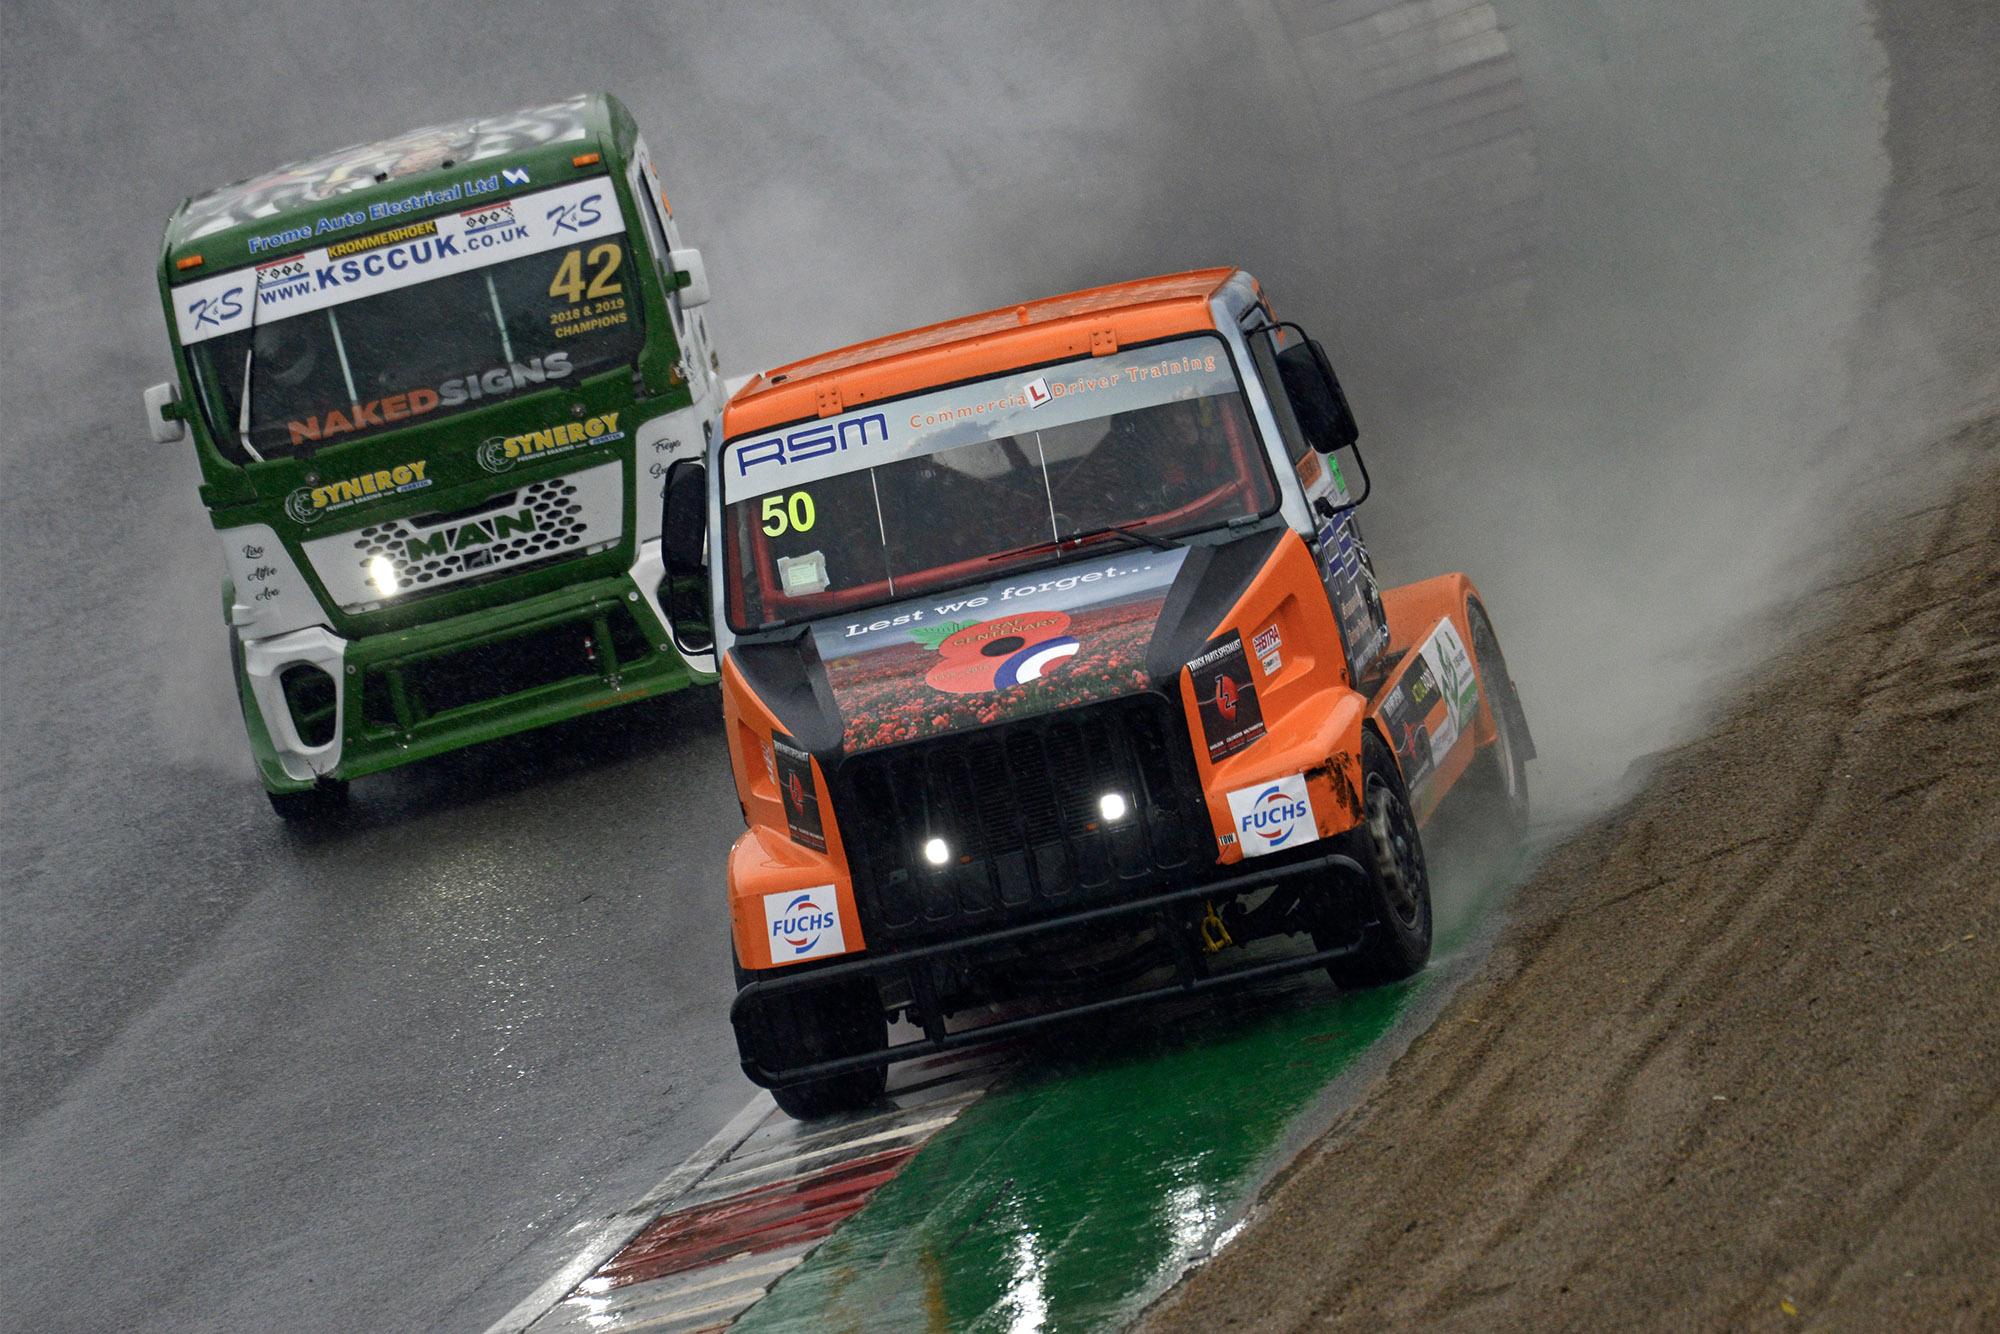 British Truck Racing Association Championship racing from Brands Hatch